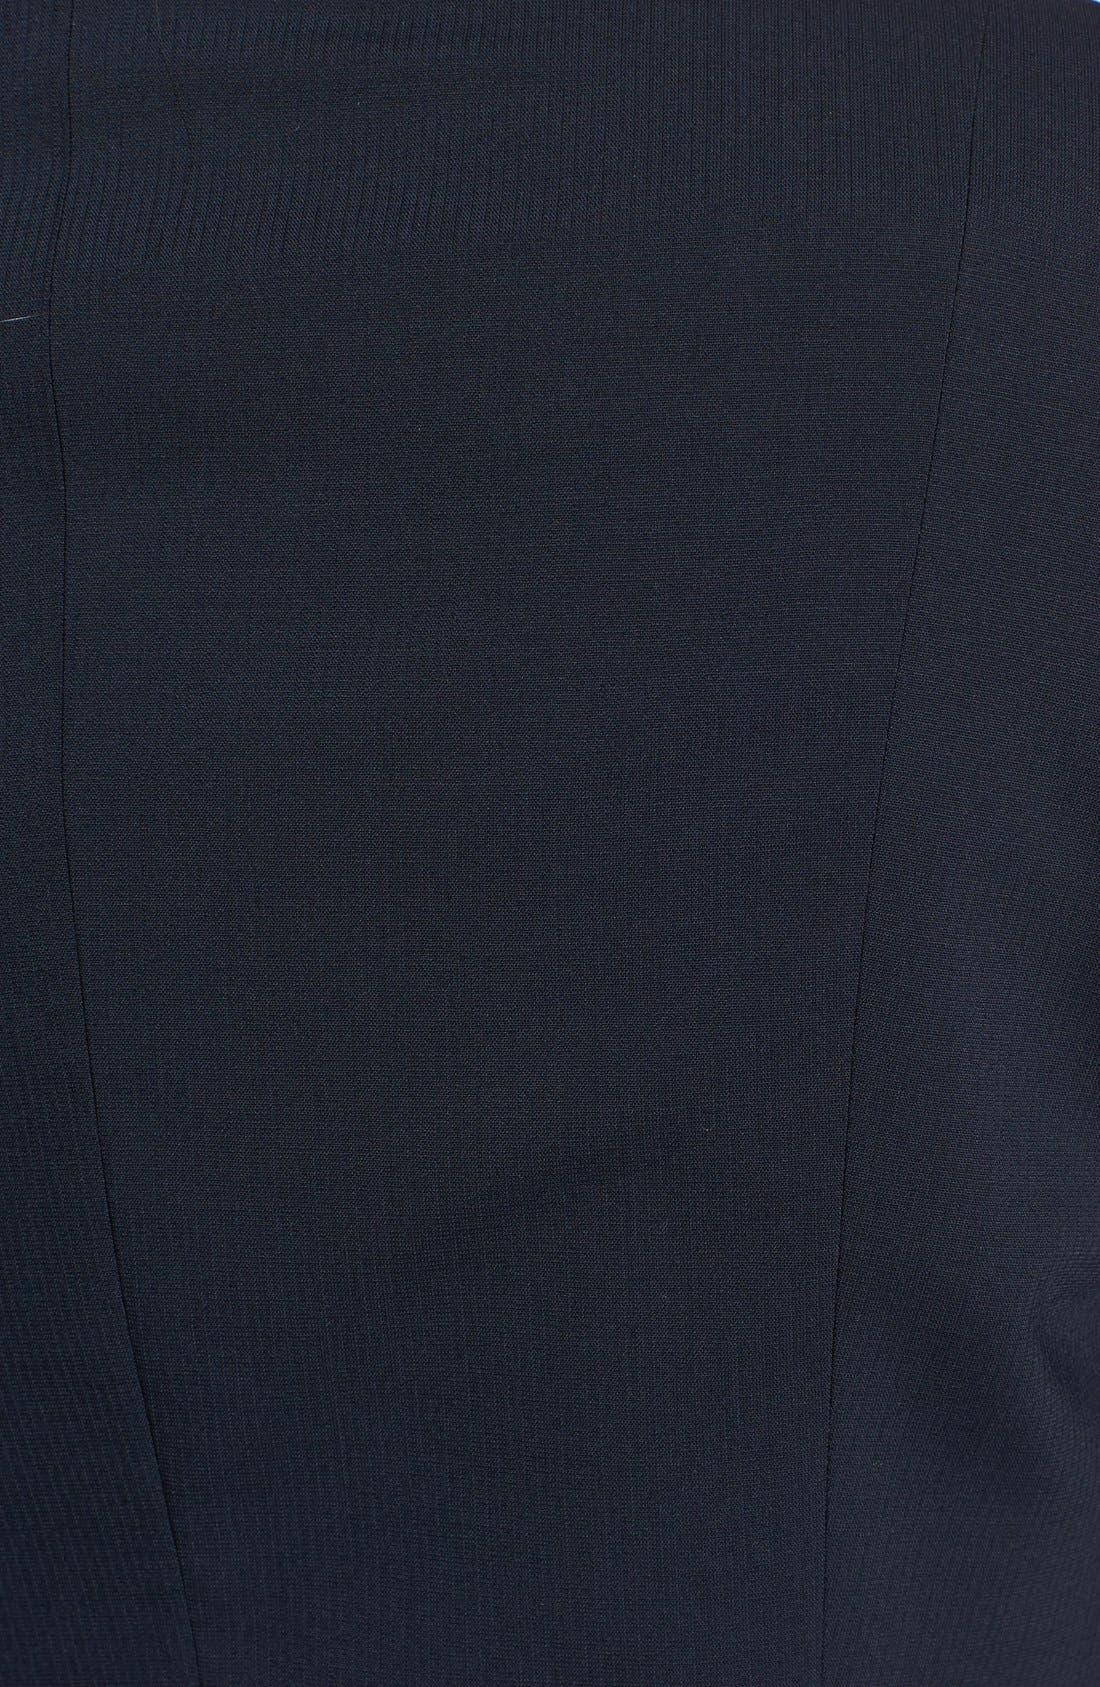 Alternate Image 3  - BOSS 'Jorila' Stretch Wool Jacket